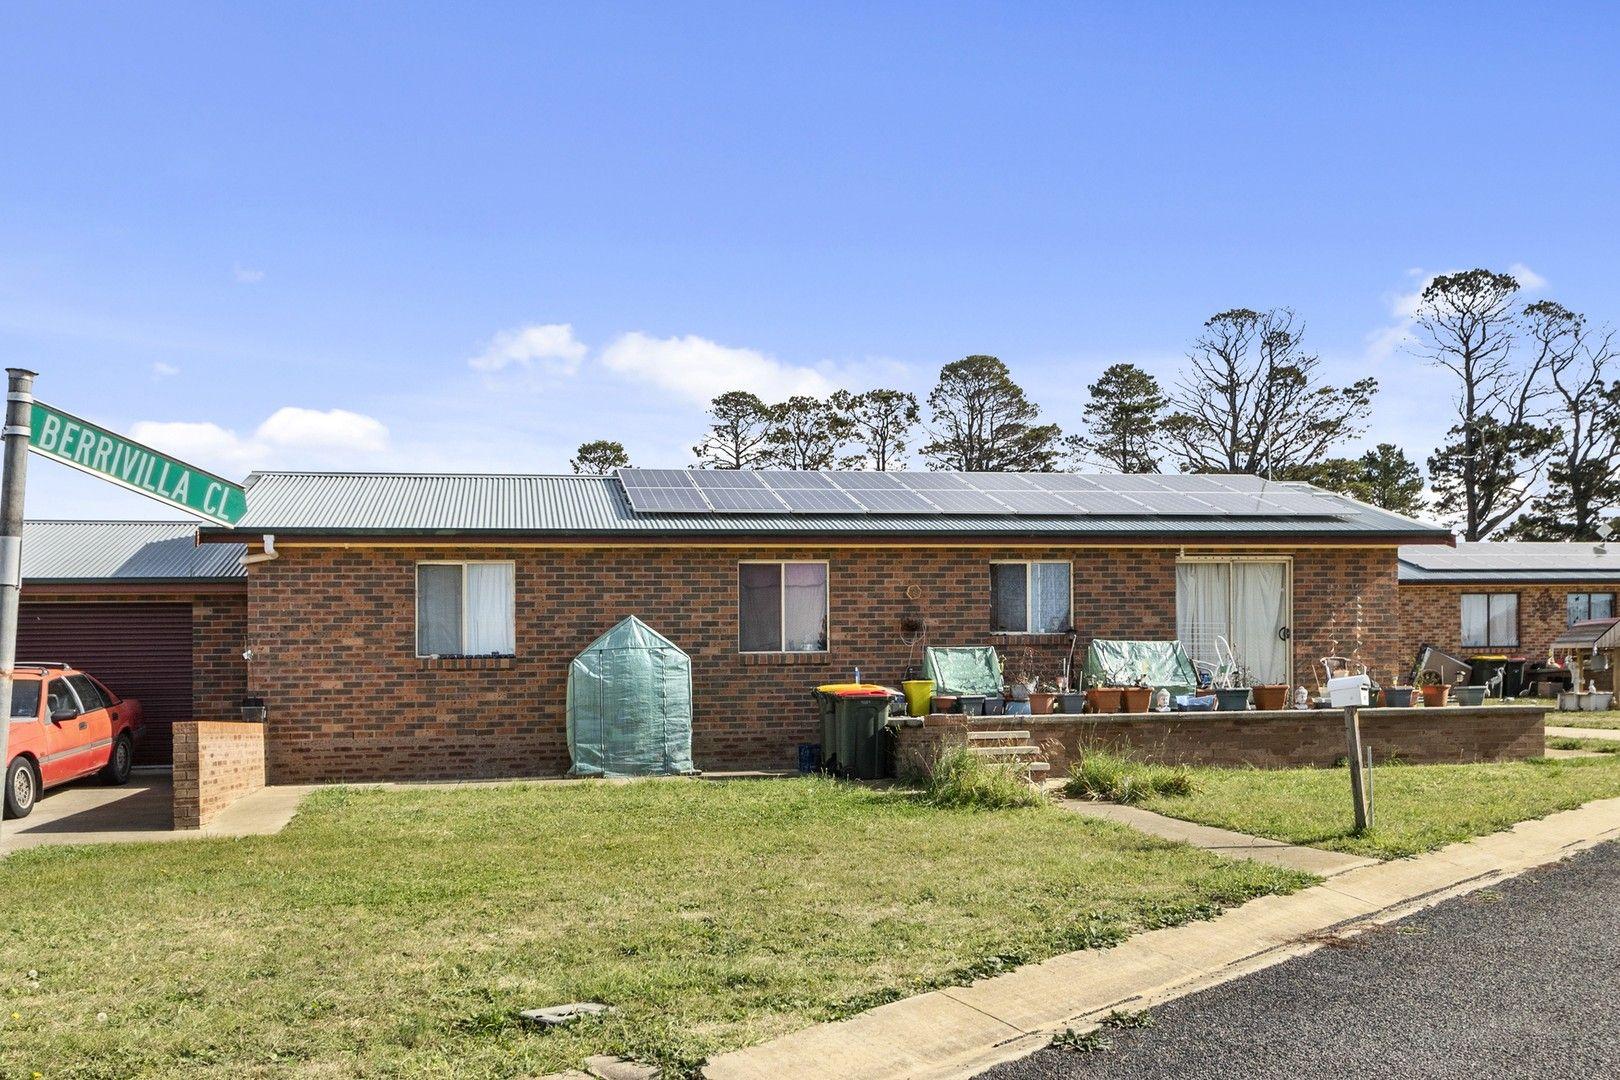 11 Berrivilla  Close, Berridale NSW 2628, Image 0